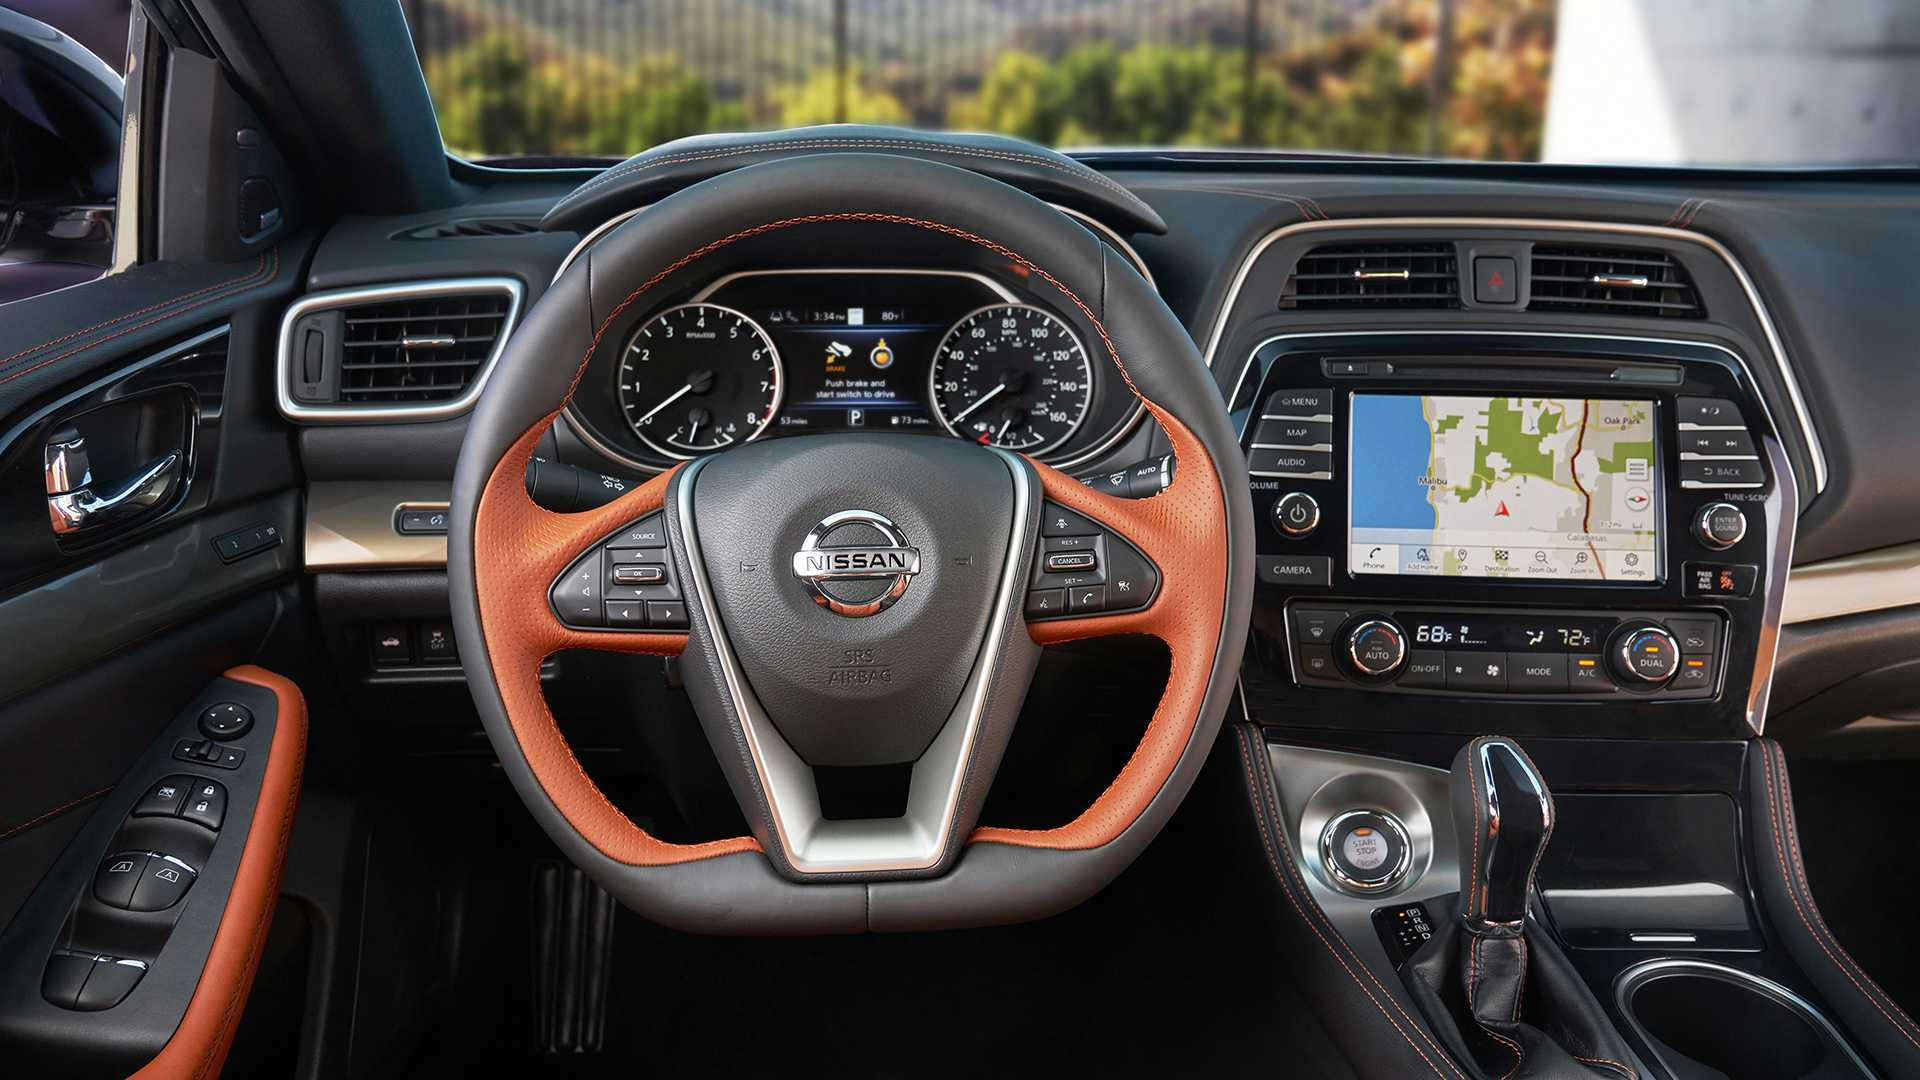 32 Concept of 2019 Nissan Maxima Platinum Price with 2019 Nissan Maxima Platinum